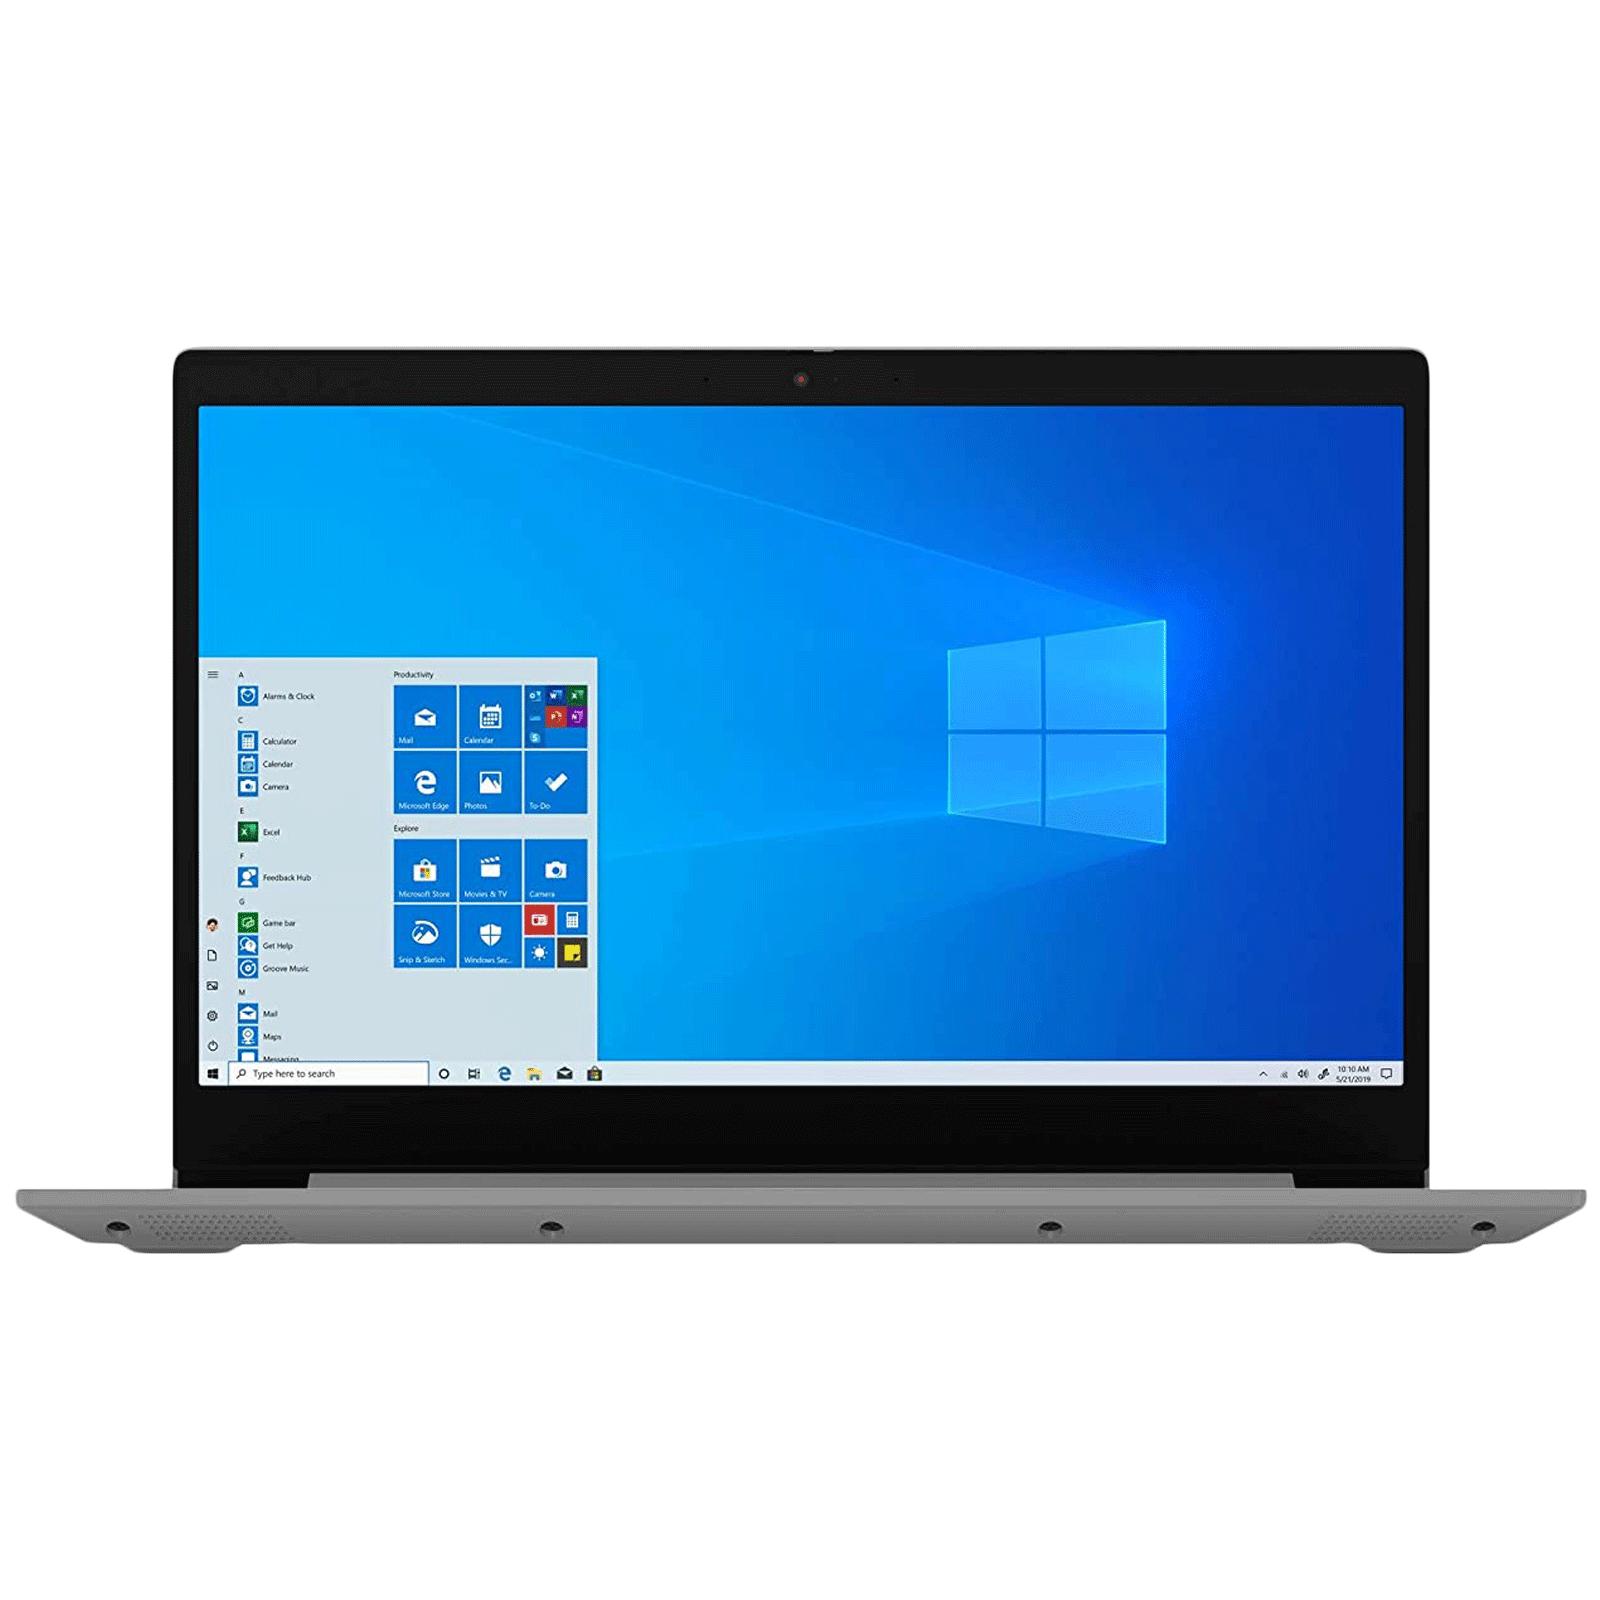 Lenovo IdeaPad 3 15IML05 Core i3 10th Gen Windows 10 Home Thin and Light Laptop (8GB RAM, 256GB SSD, Intel UHD Graphics, MS Office, 39.62cm, Platinum Grey)_1